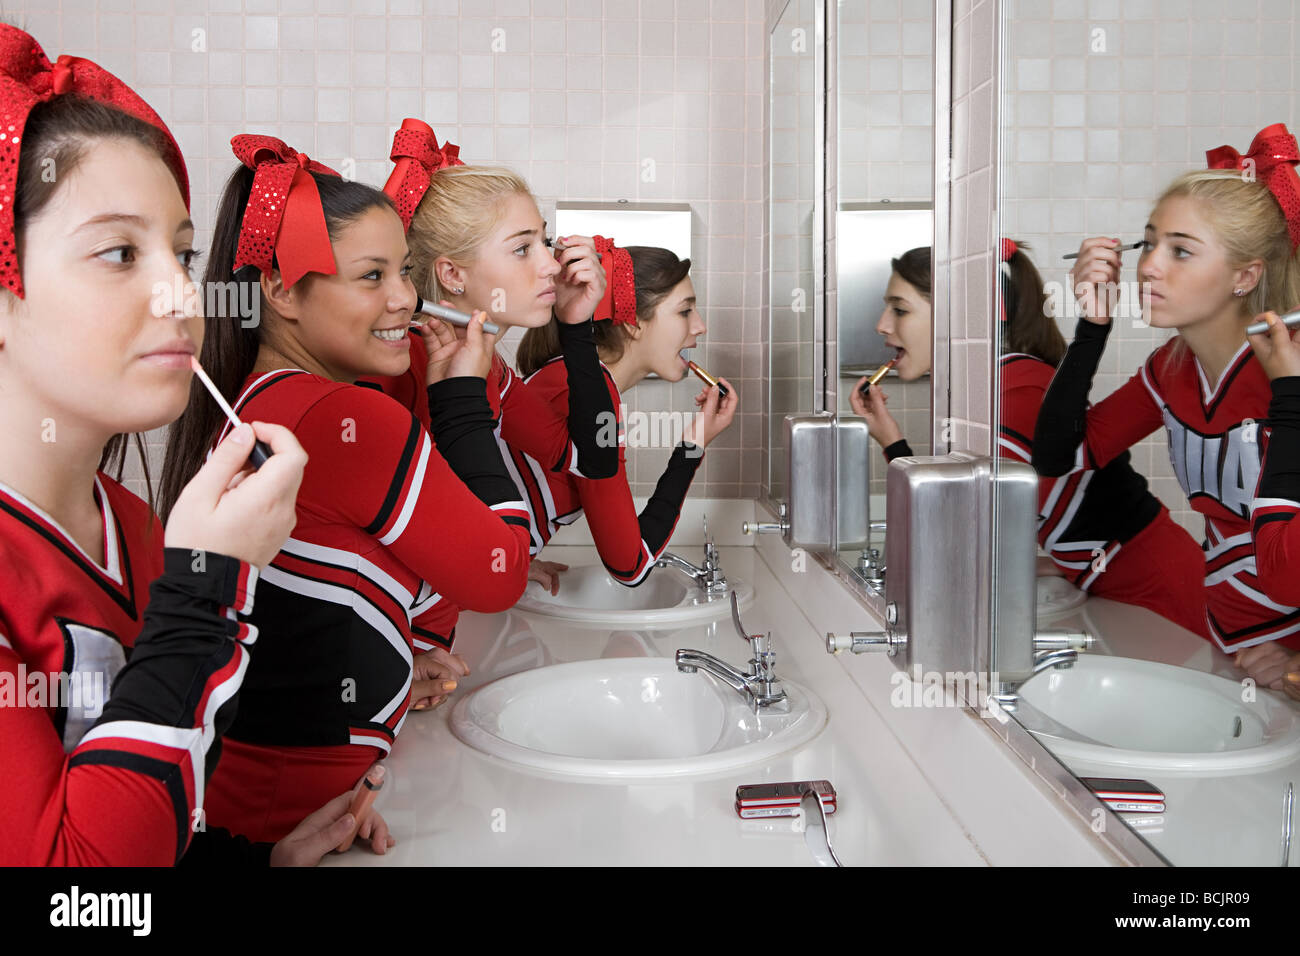 Cheerleaders putting on make up - Stock Image